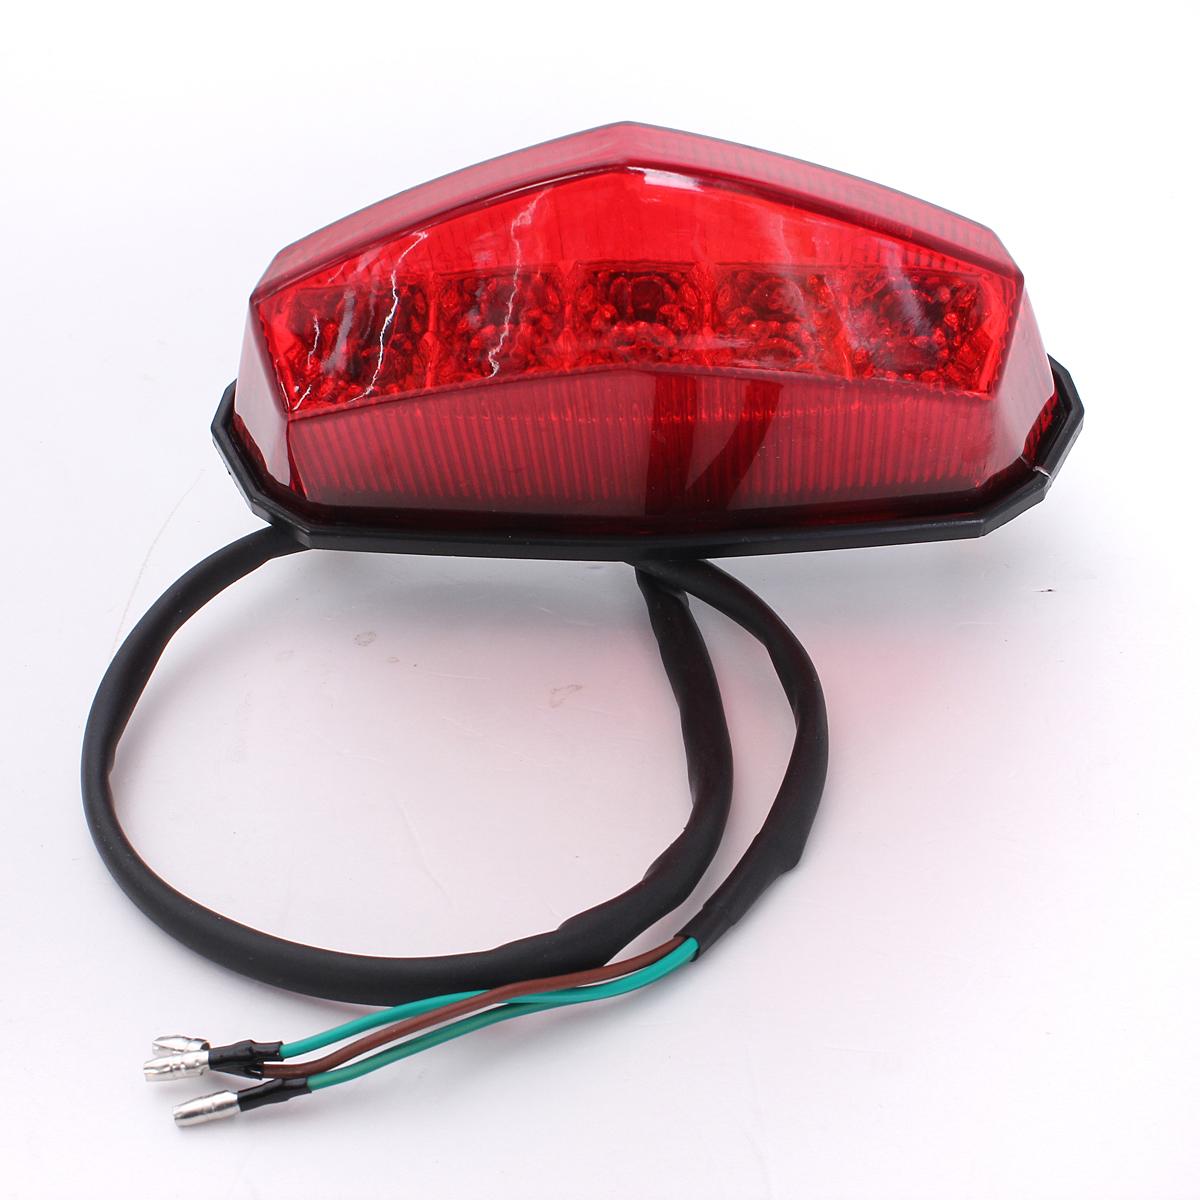 universal red led motorcycle motorbike rear tail brake stop light lamp ebay. Black Bedroom Furniture Sets. Home Design Ideas